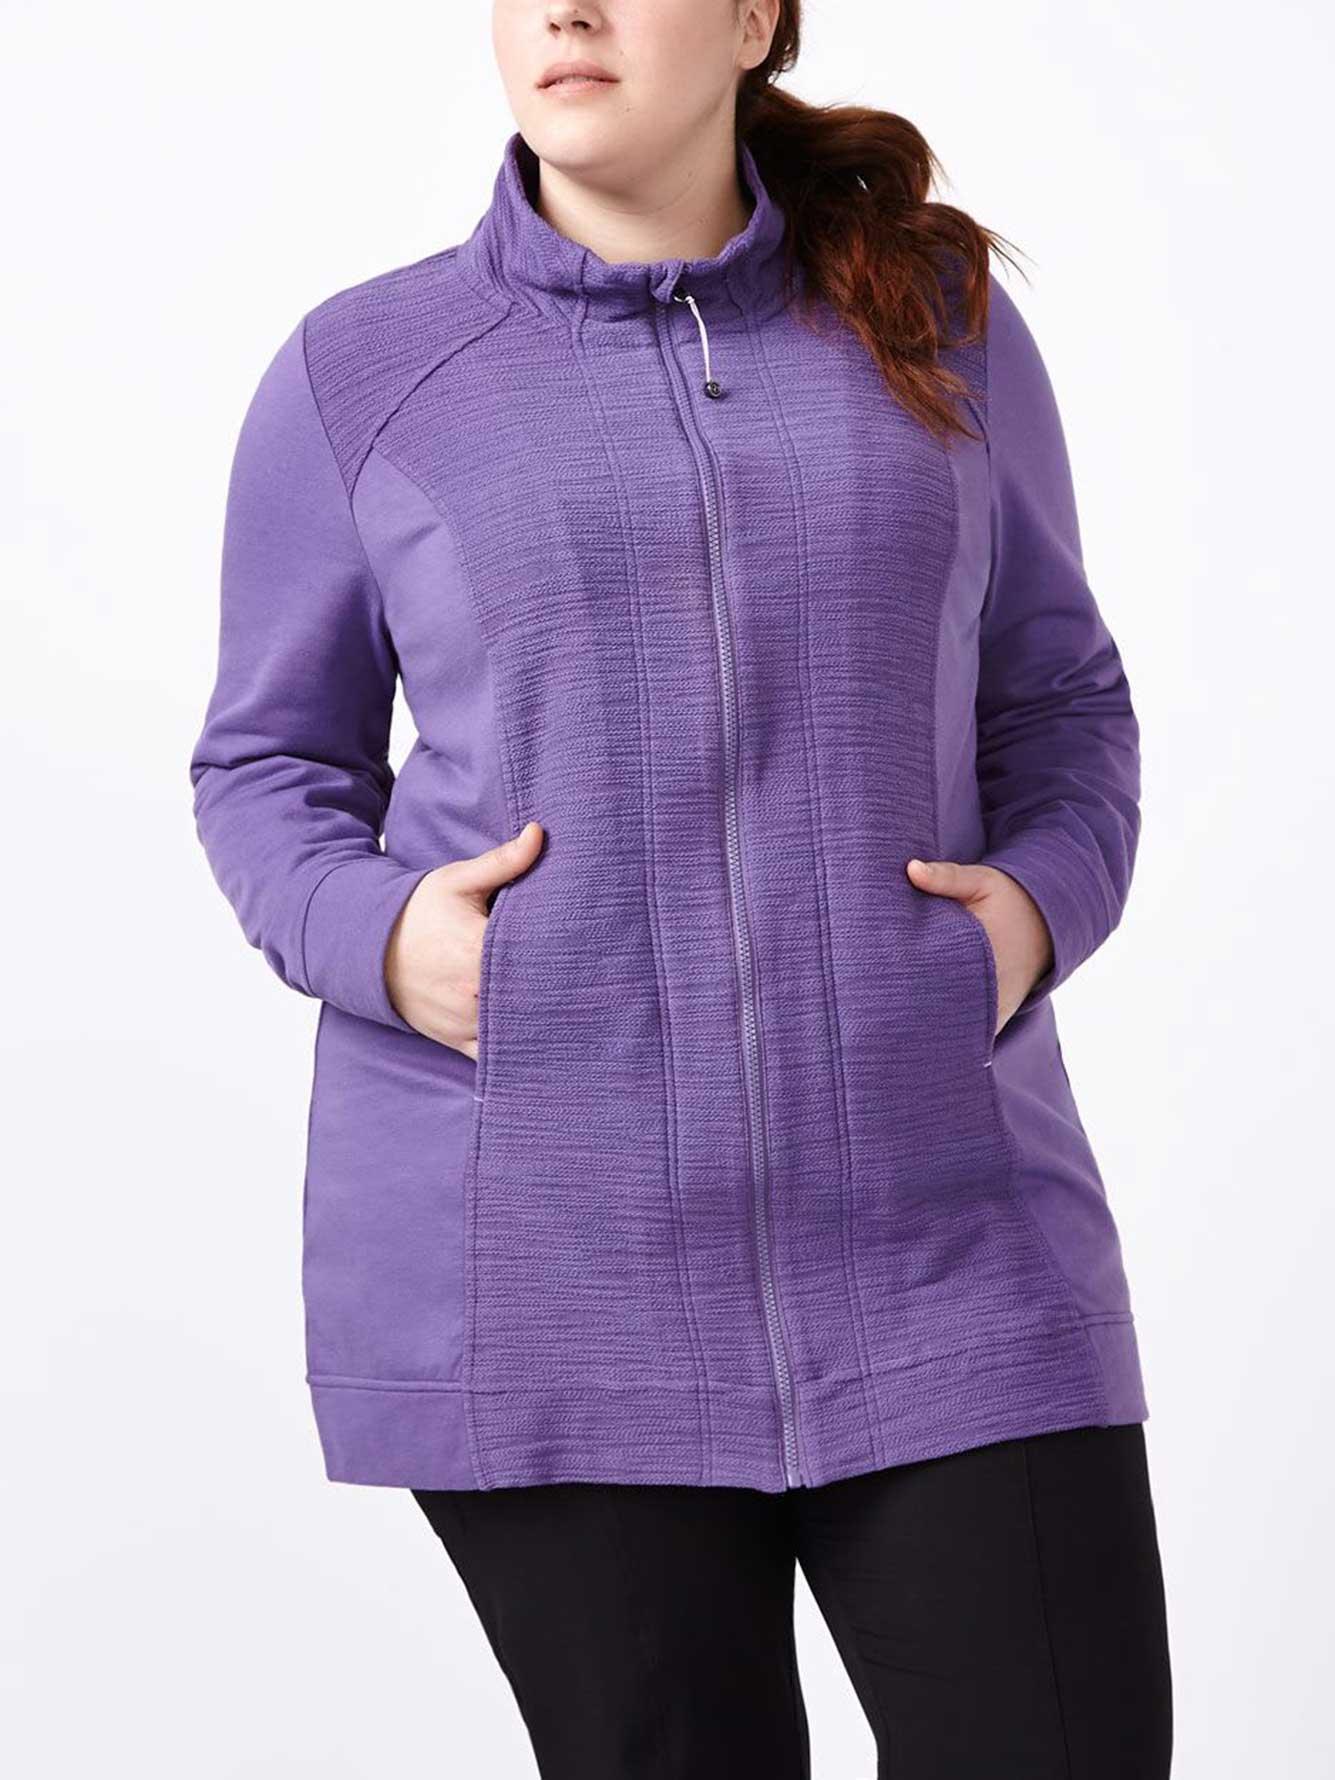 685150a6f29 Sports - Plus-Size Zip Up Jacket